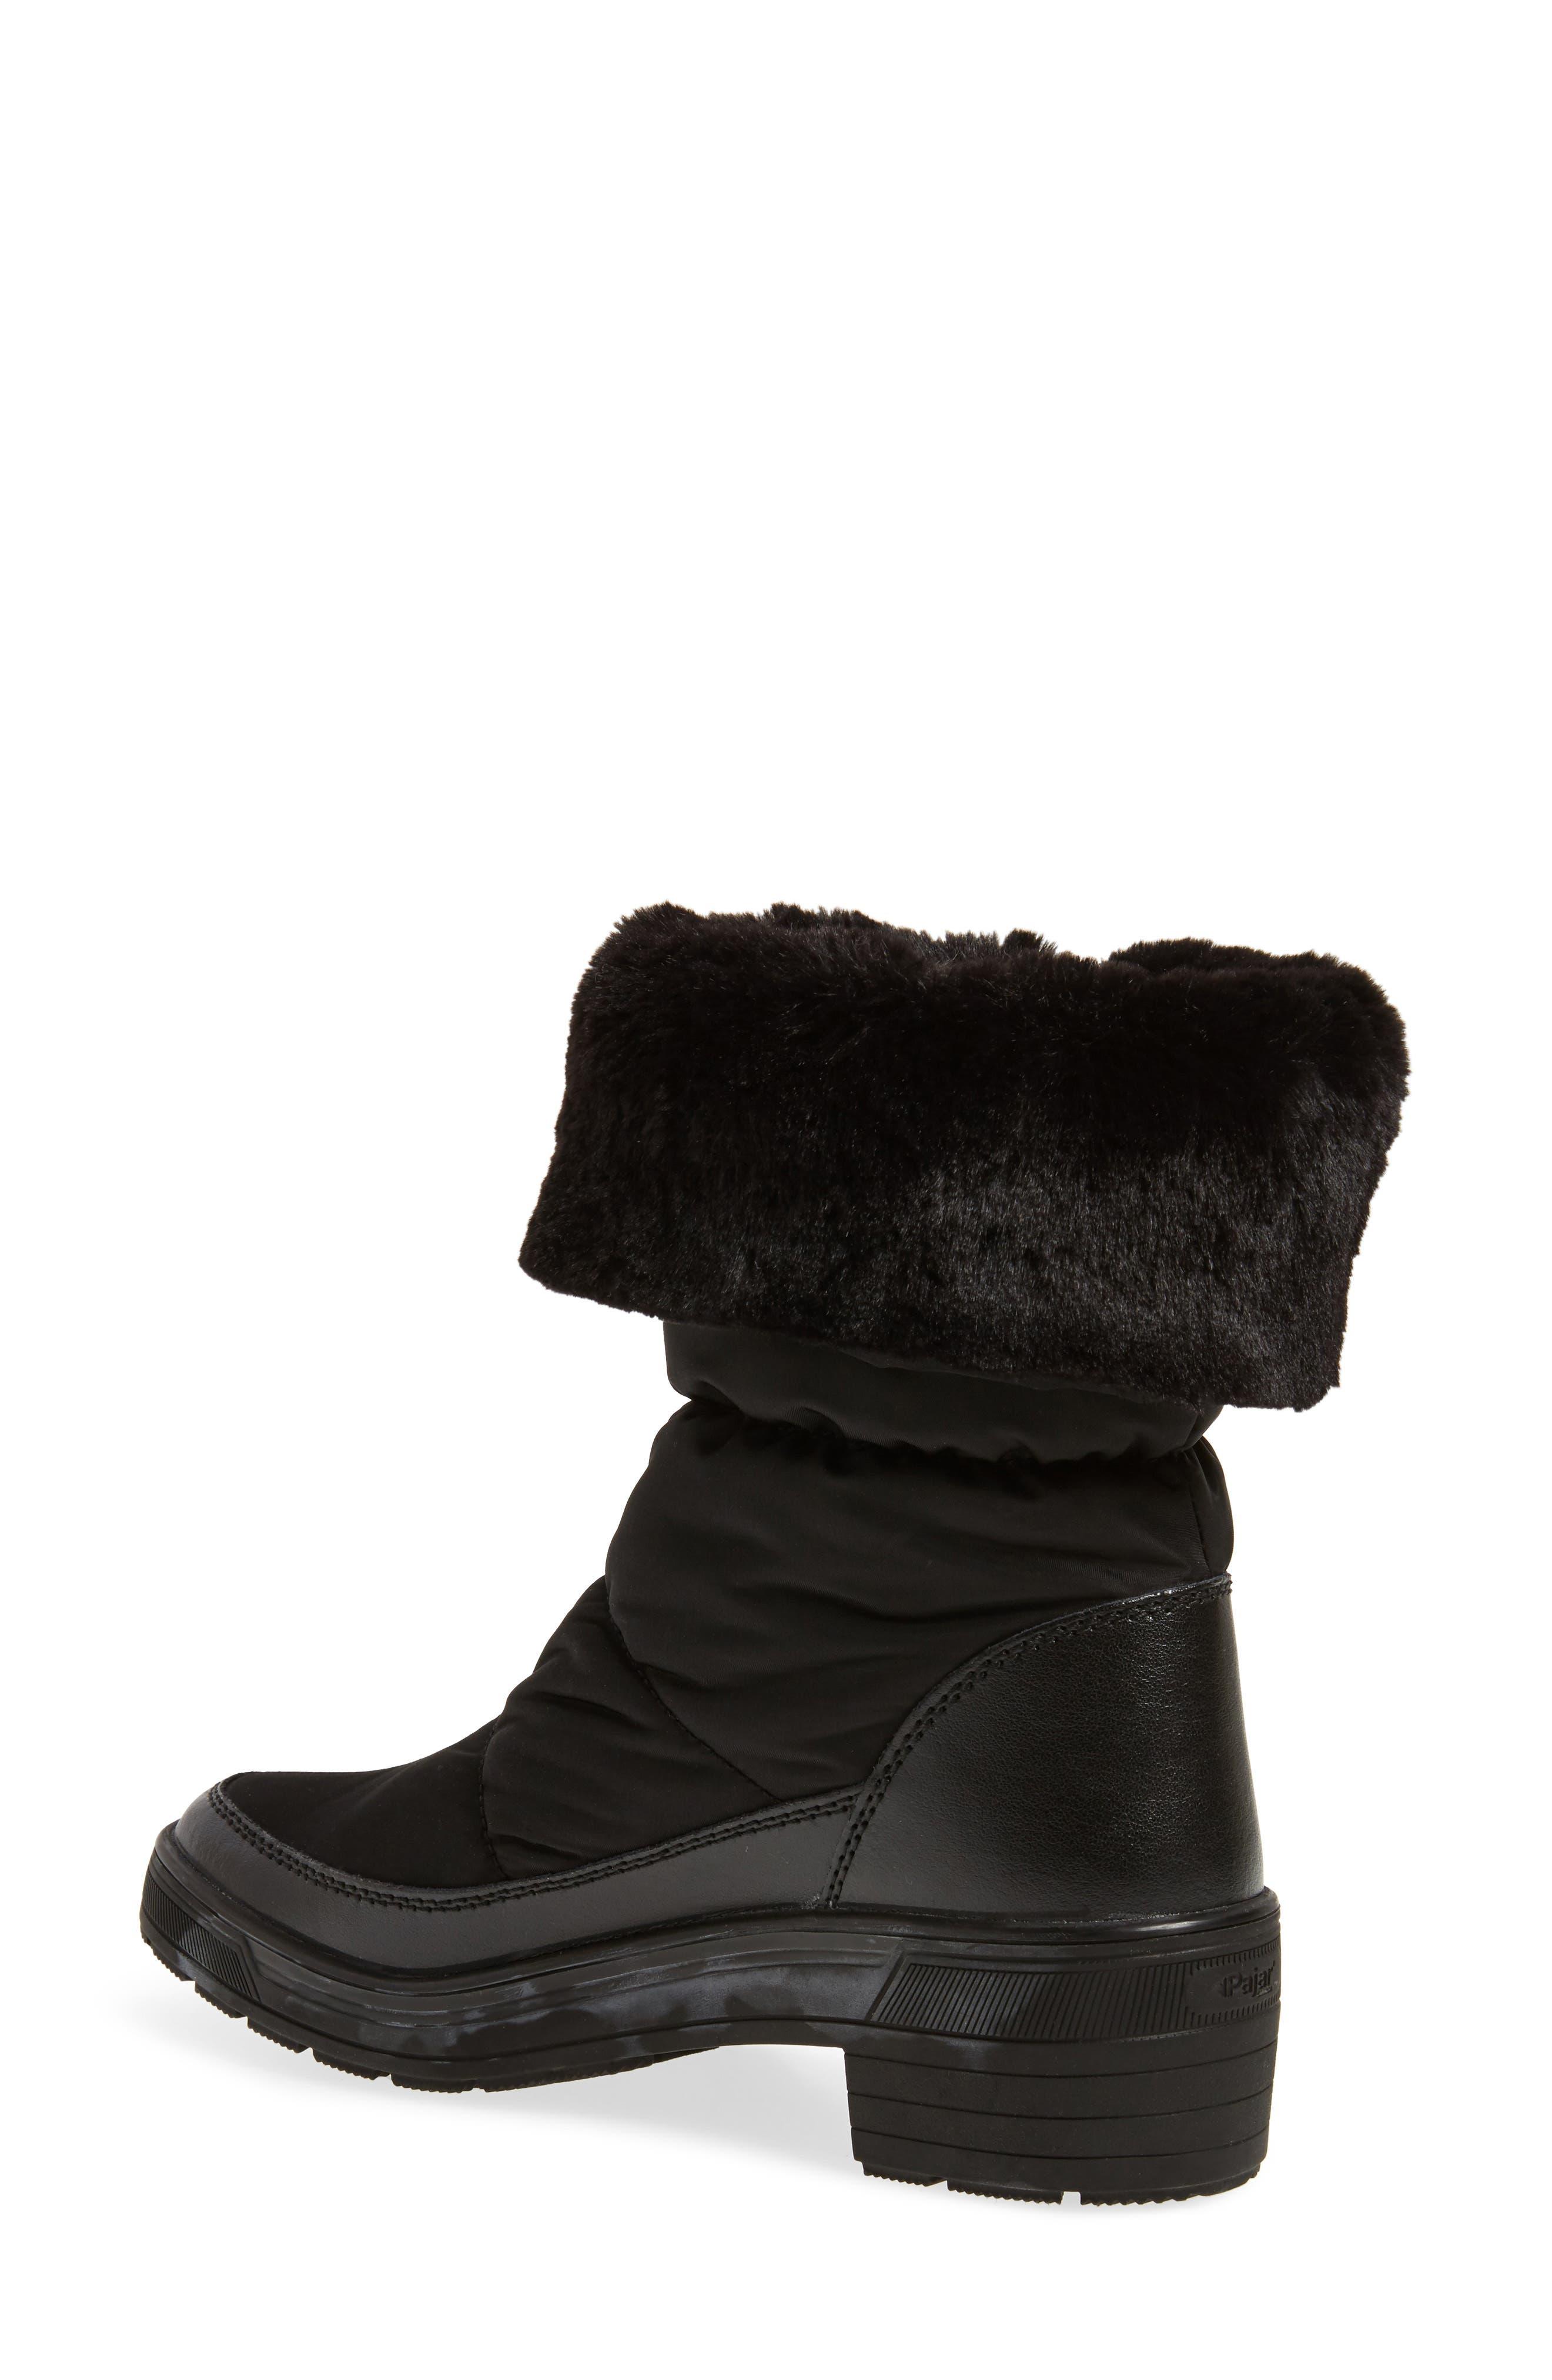 Ventura Weatherproof Faux Fur Lined Boot,                             Alternate thumbnail 2, color,                             001